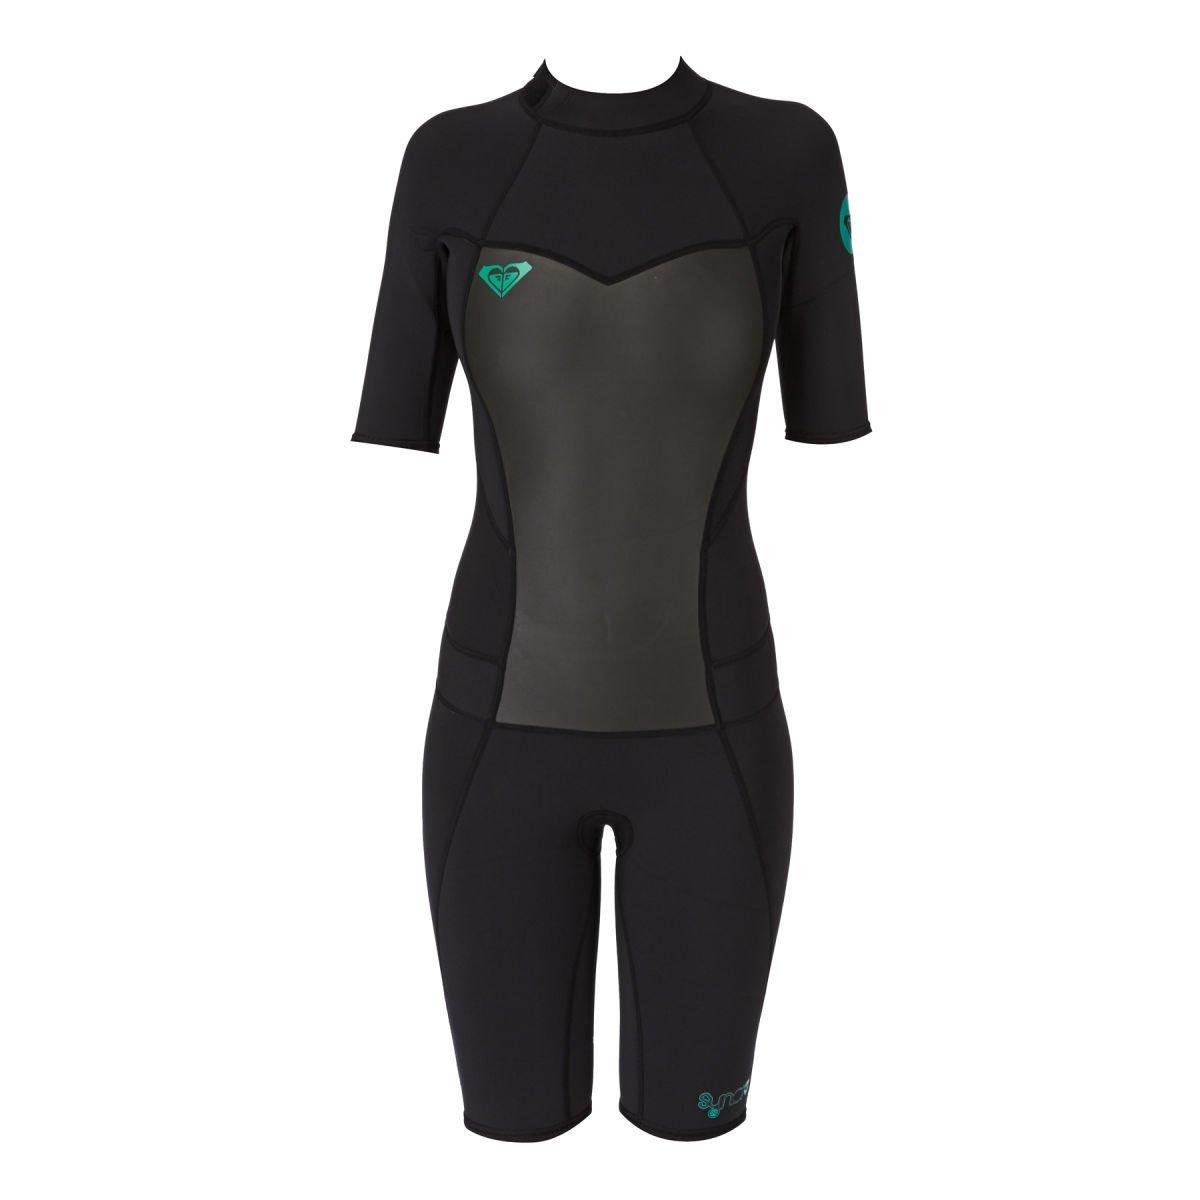 f02728d946 Roxy Syncro 2mm Springsuit Shorty Wetsuit - Girls - Graphite gray purple